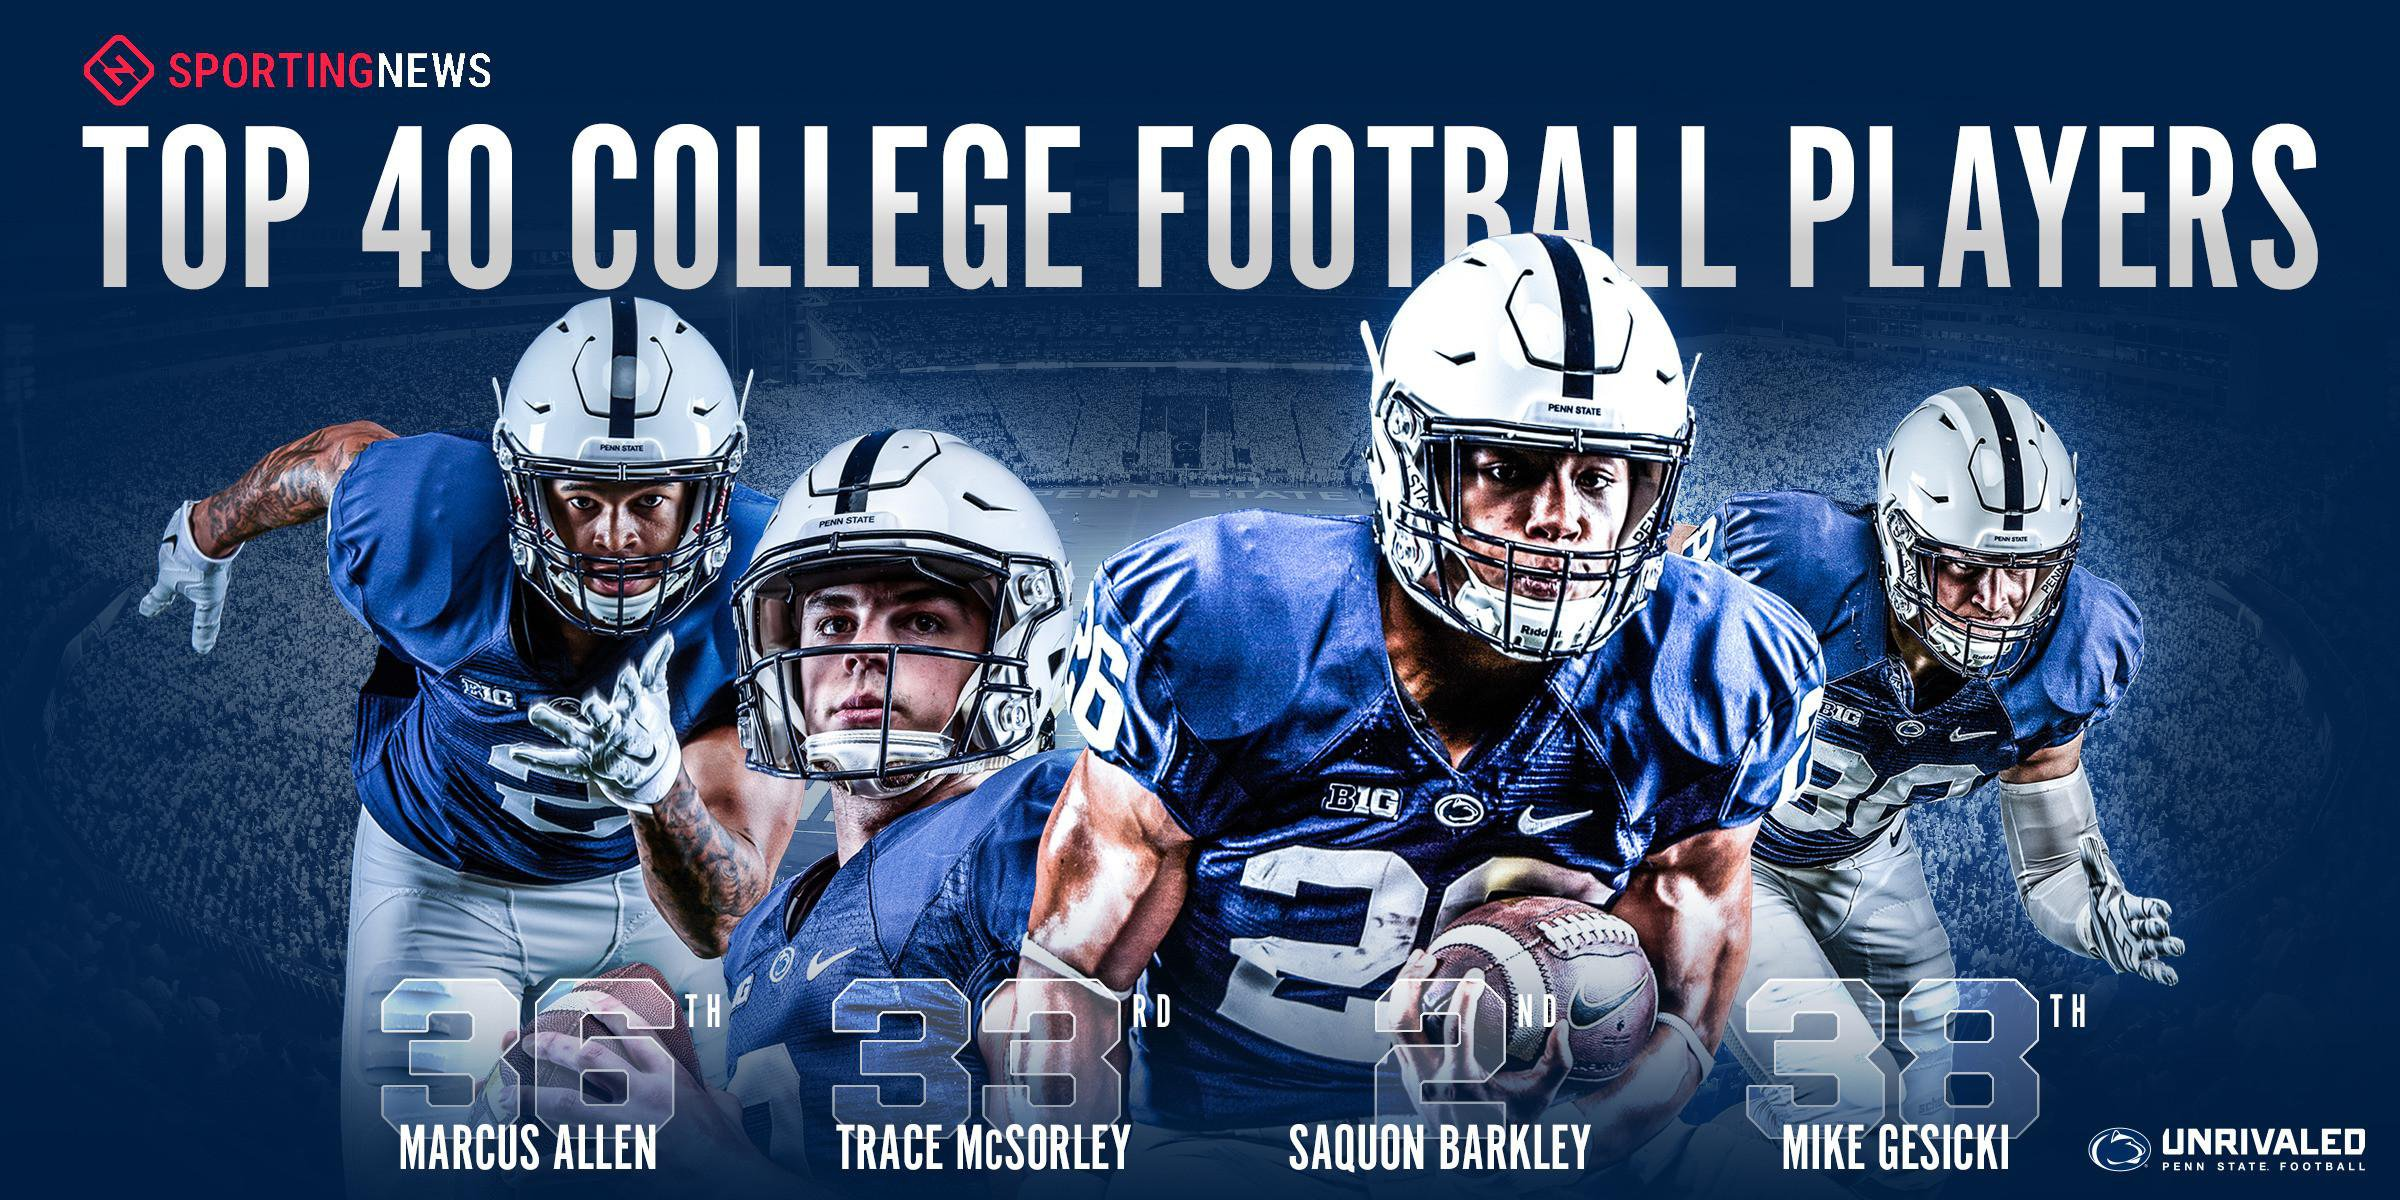 Saquon Barkley no2 Top College Football Players Wallpaper 2400x1200